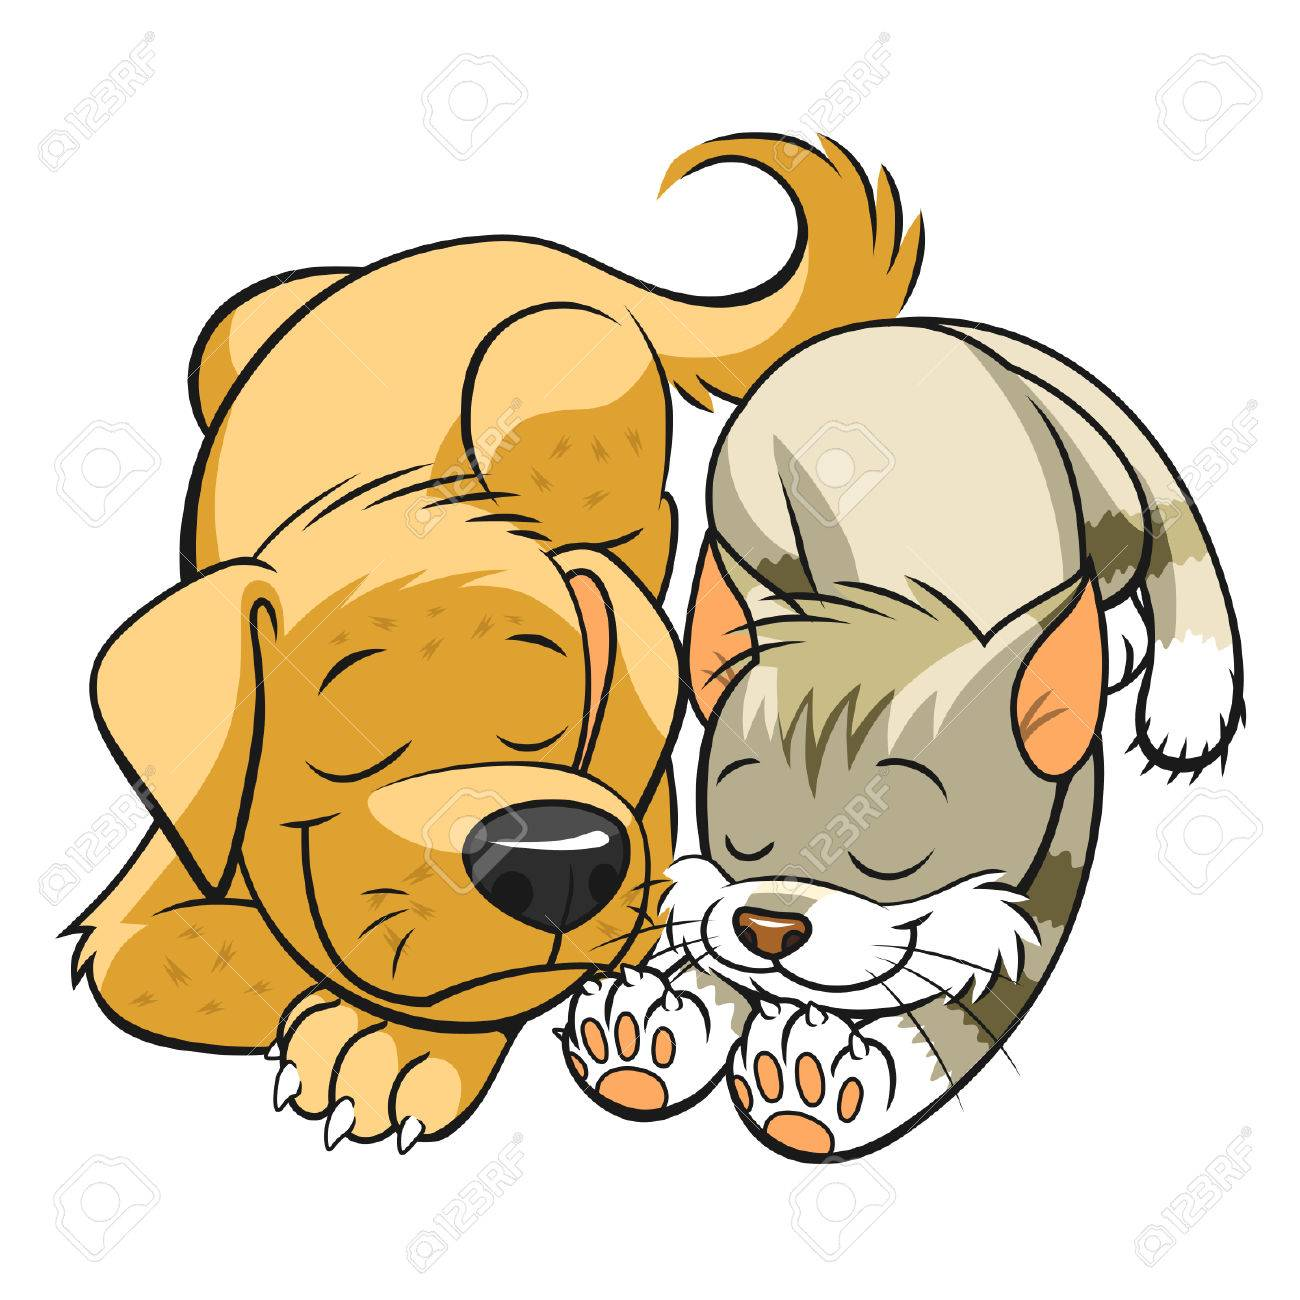 Pets sleeps - 35146928